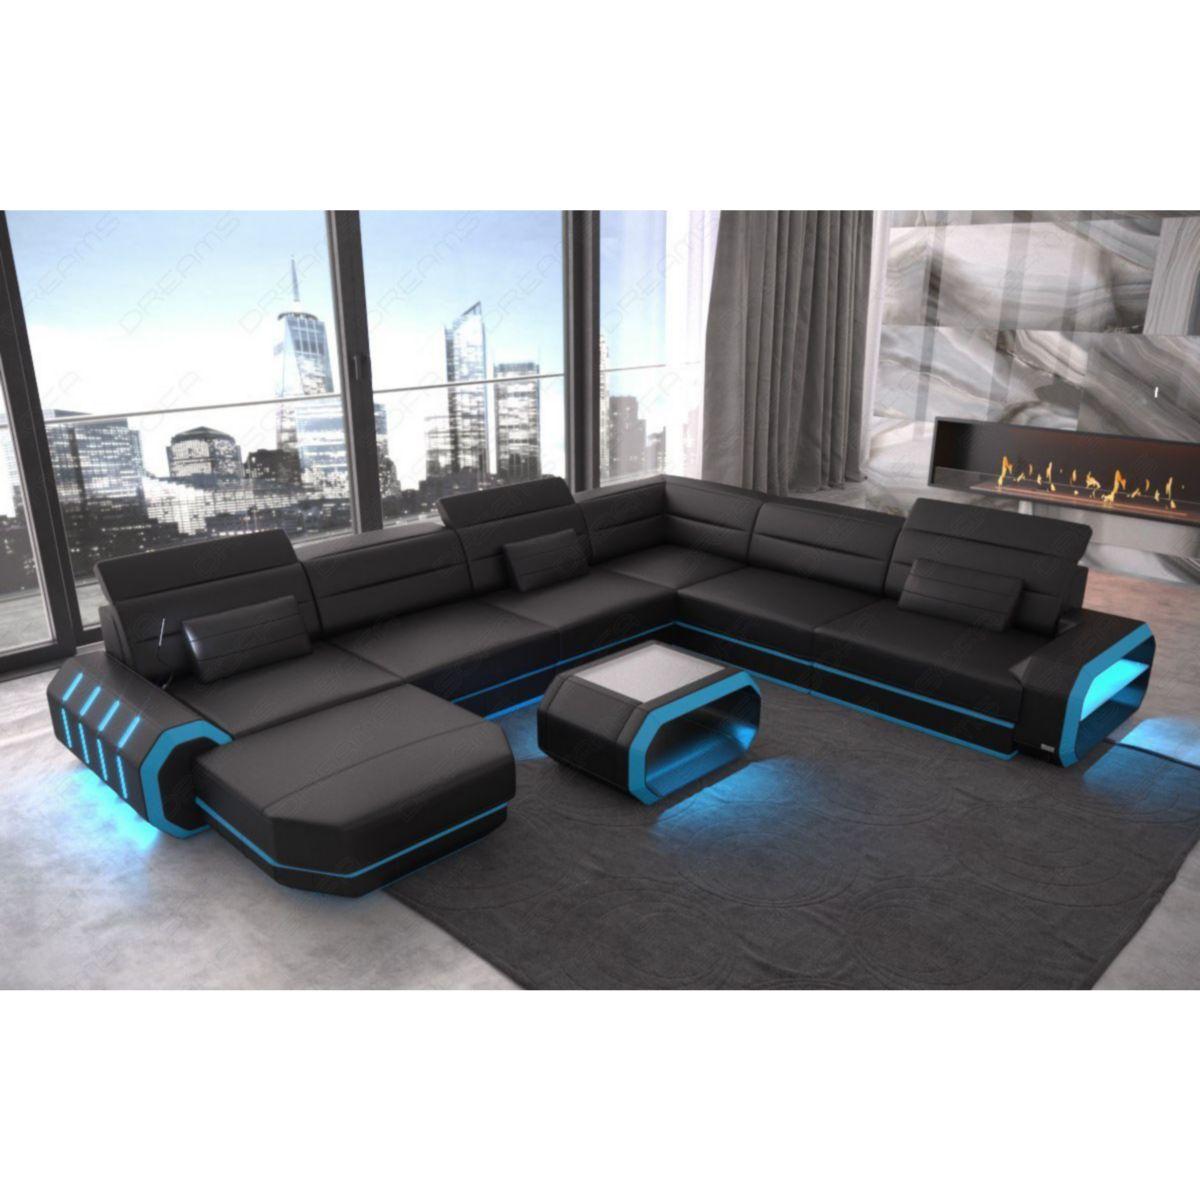 Sofa Dreams Wohnlandschaft Roma XXL